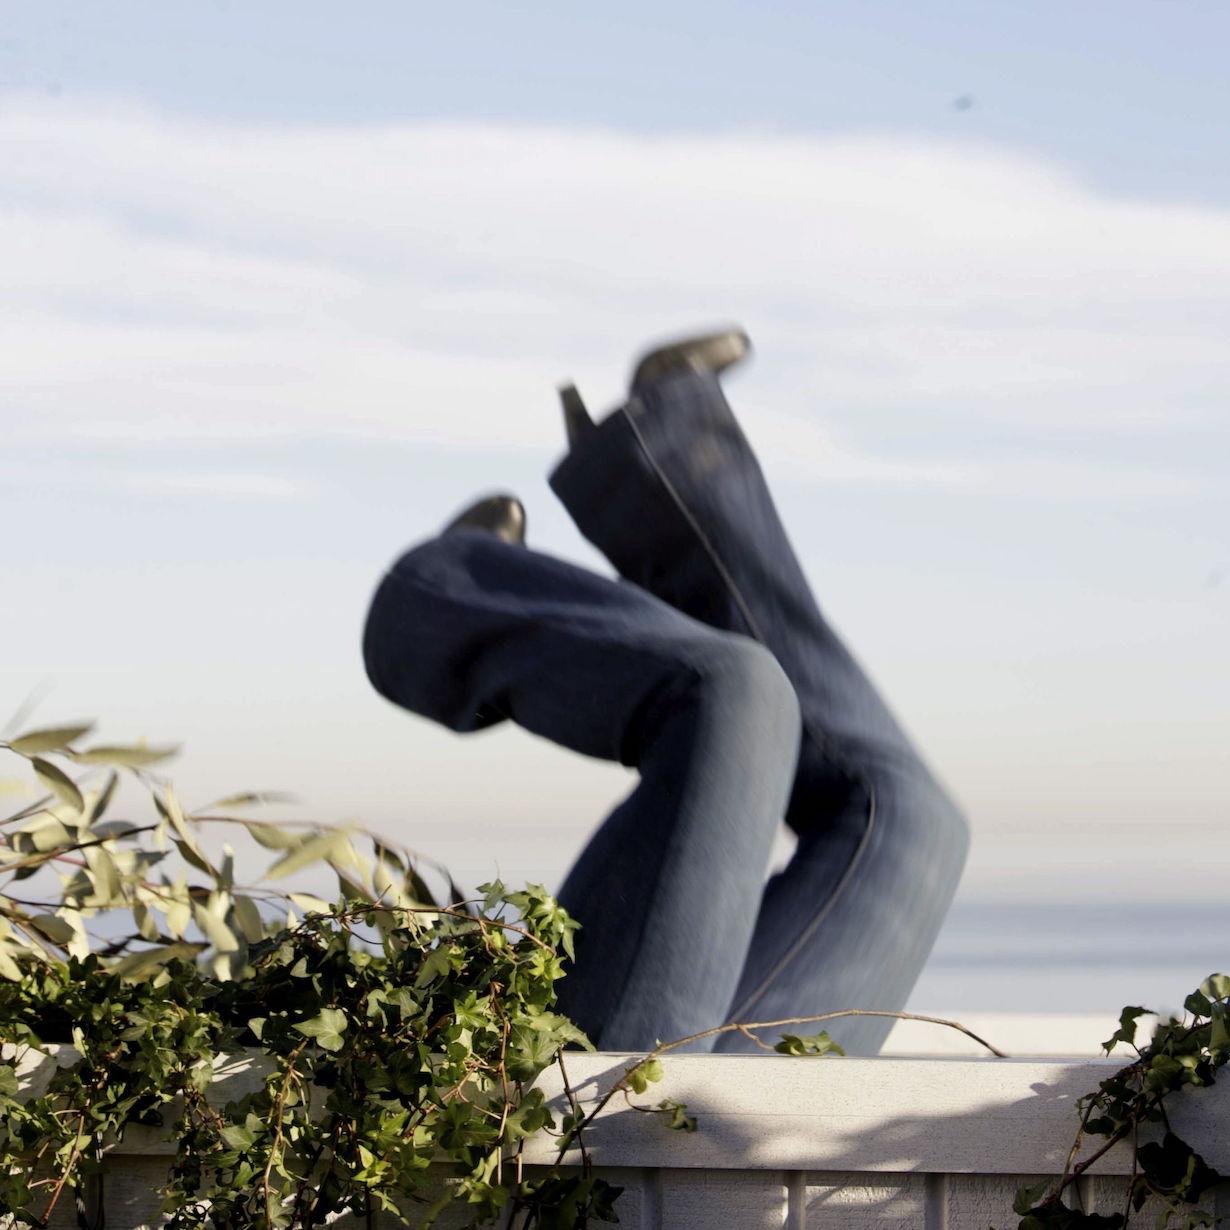 "Adrienne Frantz bill pushes amber over ledge ""The Bold and the Beautiful"" Set LocationMalibu, Ca01/24/11©sean smith/jpistudios.com310-657-9661Episode # 6019U.S.Airdate 03/04/11 view"